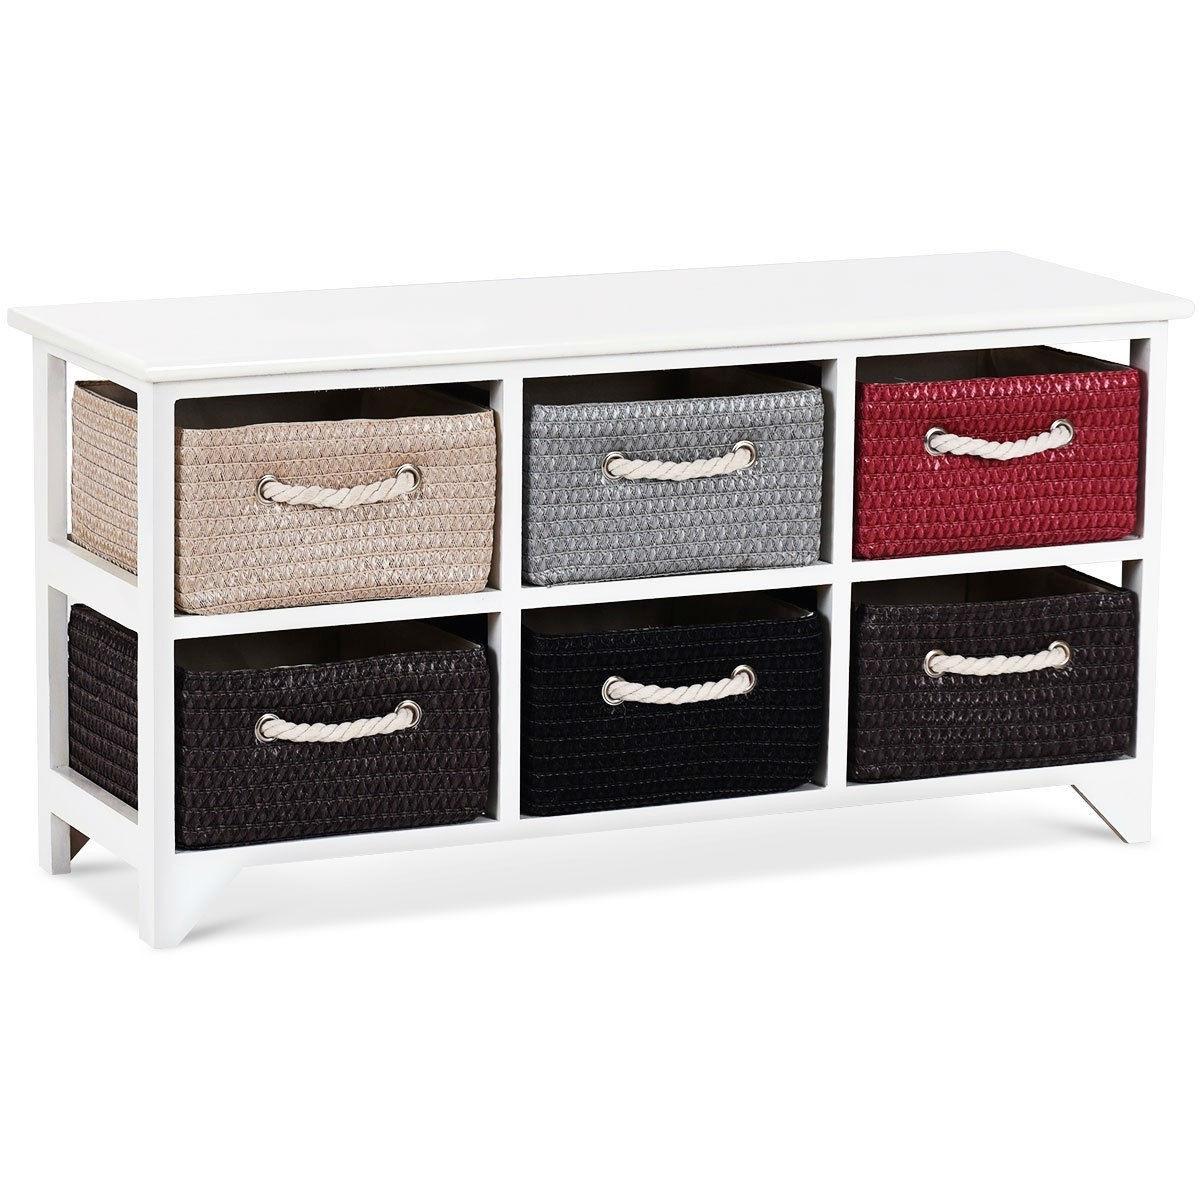 2 tier white wooden chest dresser with 6 rattan wicker baskets drawers